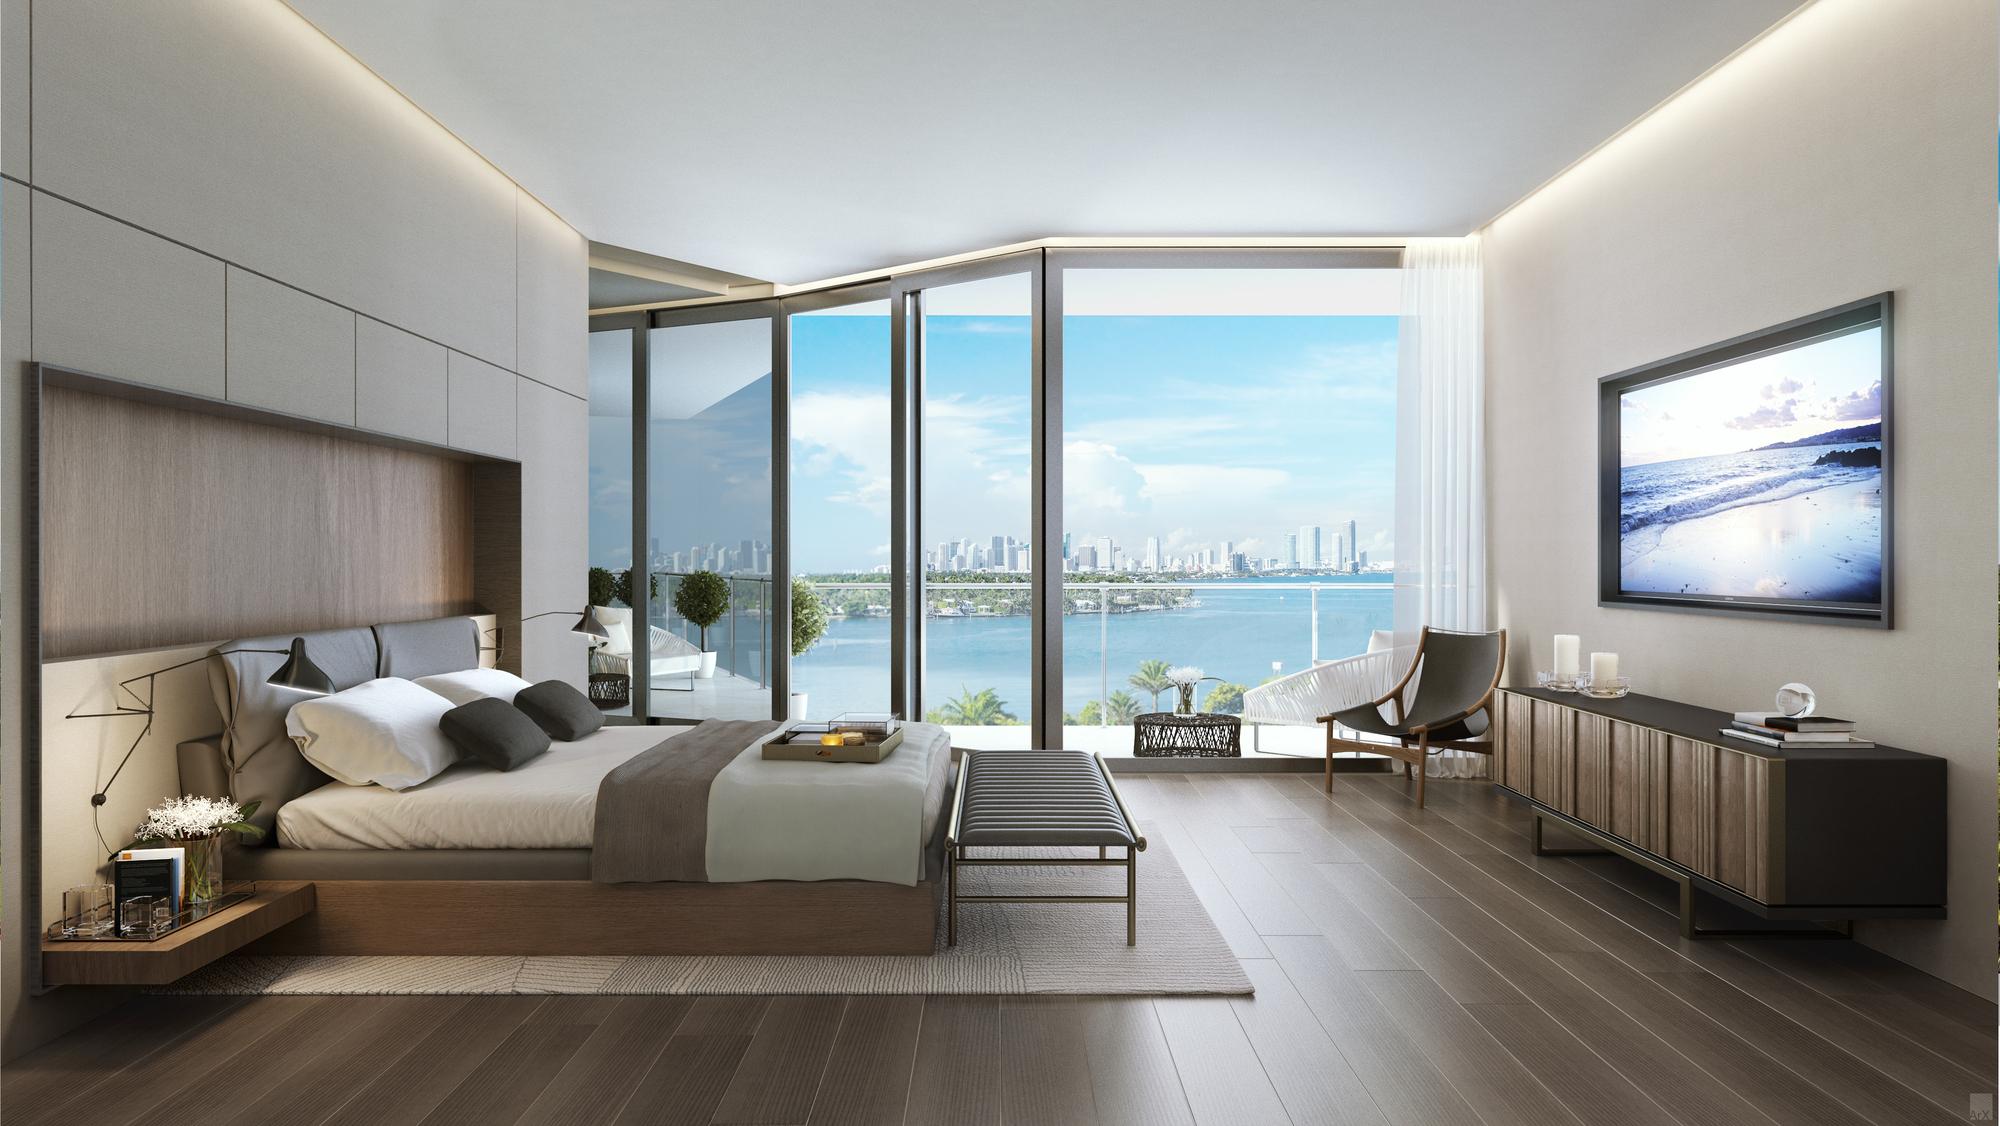 Bedroom Apartments Miami Beach